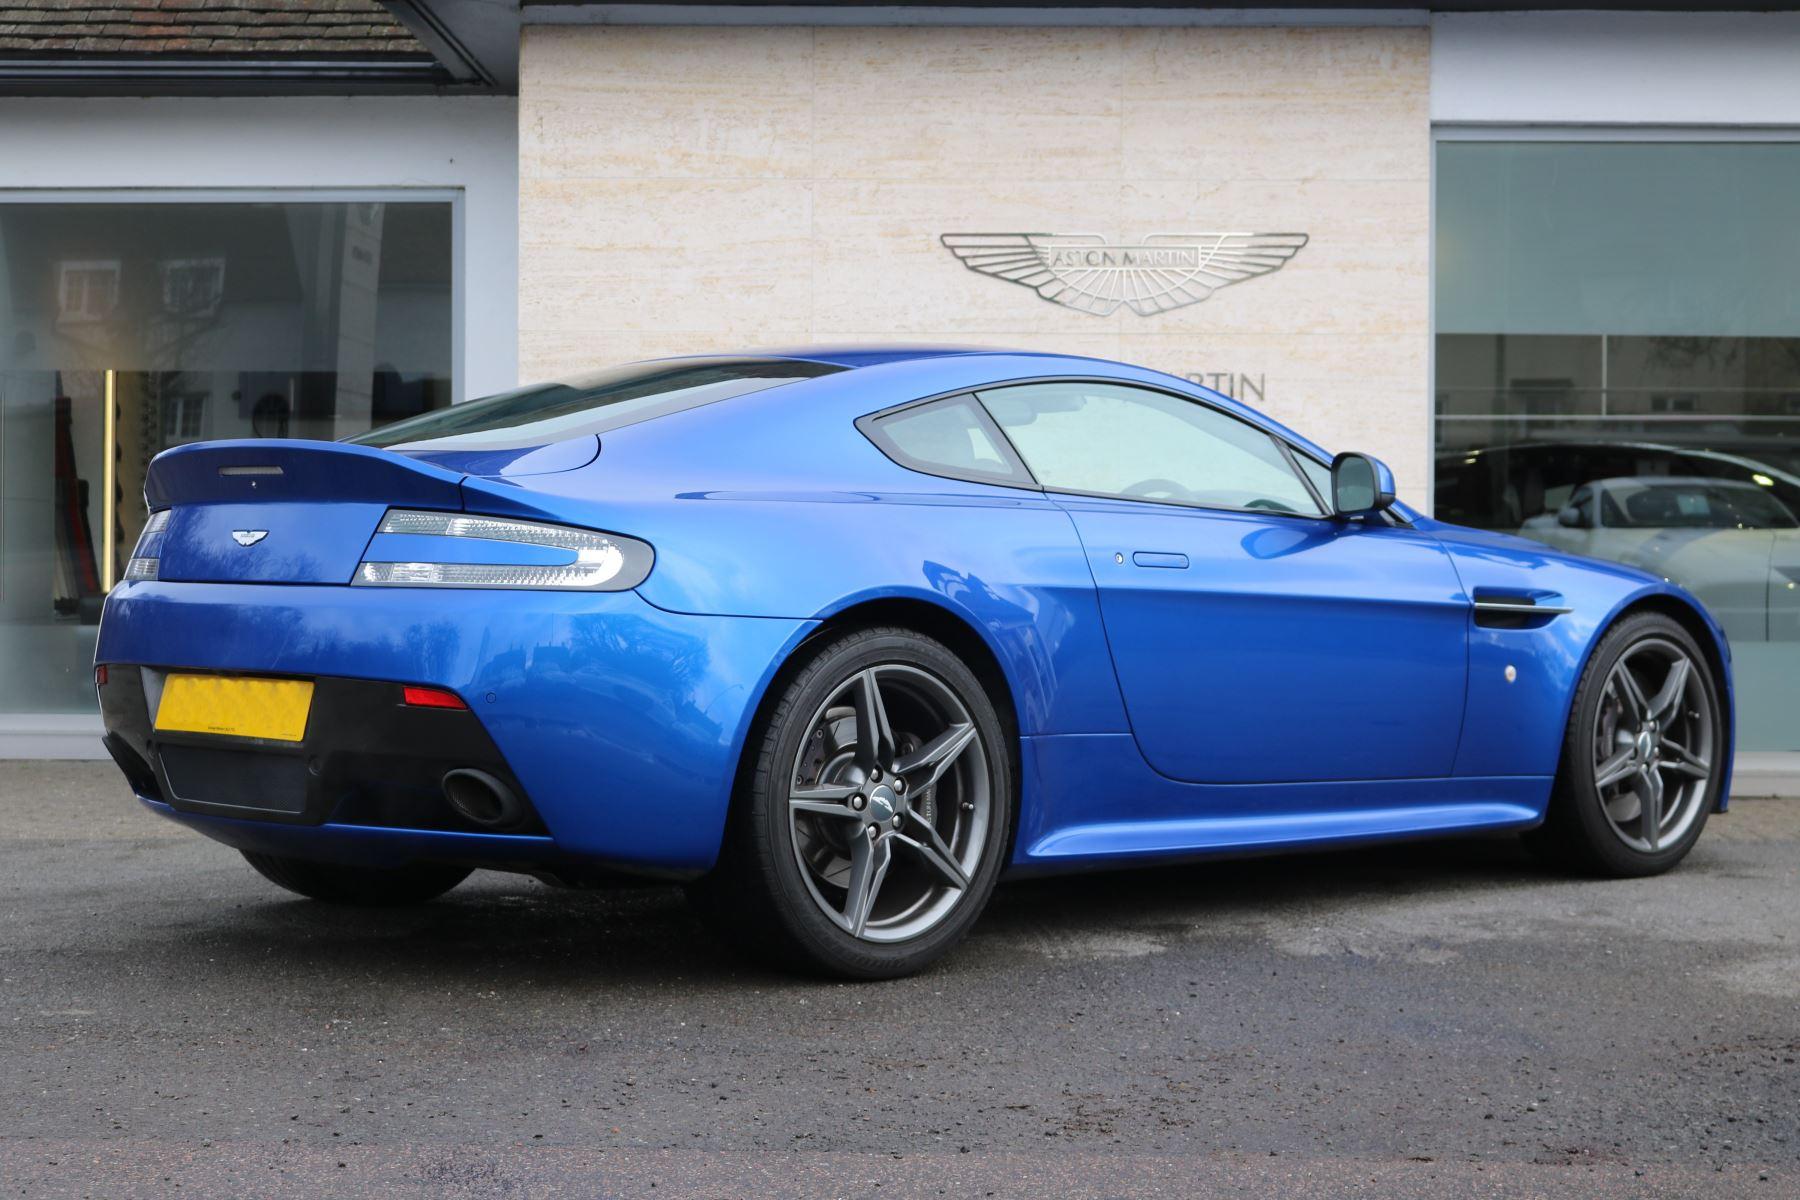 Aston Martin V8 Vantage S S 2dr Sportshift image 5